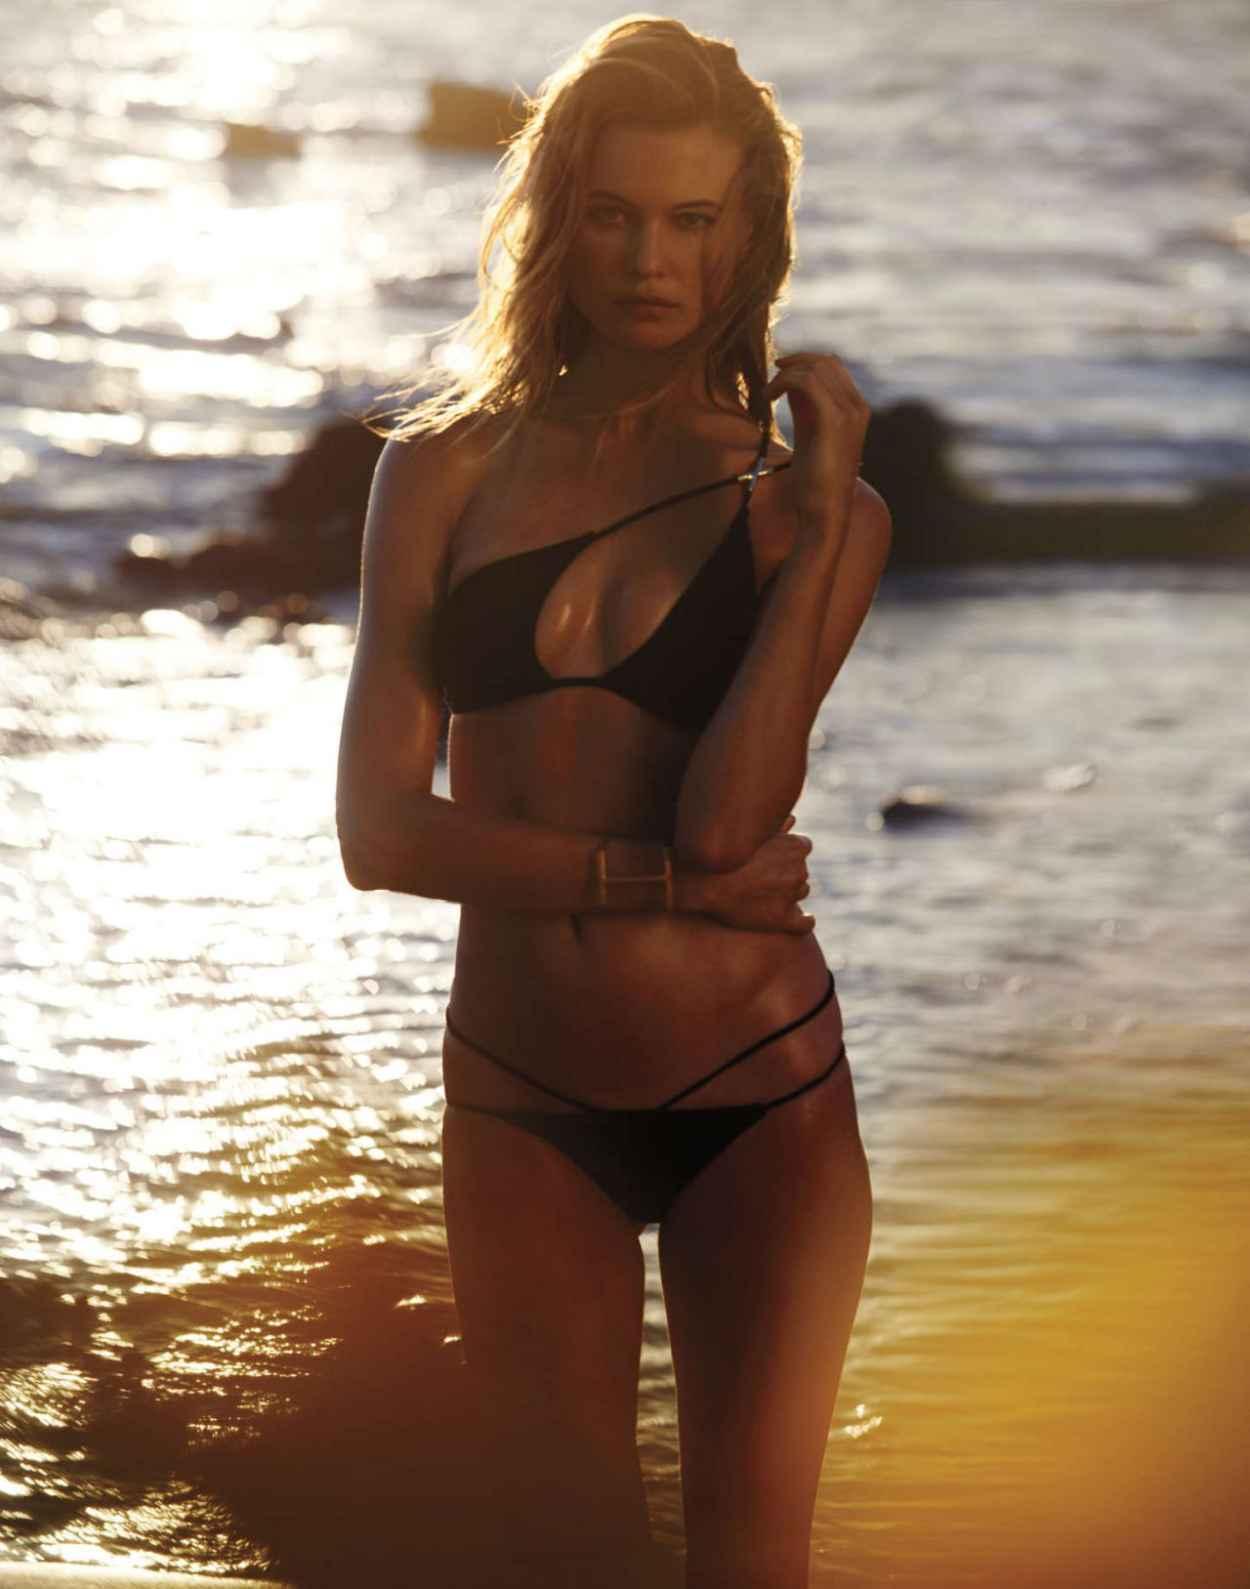 Behati Prinsloo Bikini Pics - Victoria-s Secret Swim Catalog 2015-2